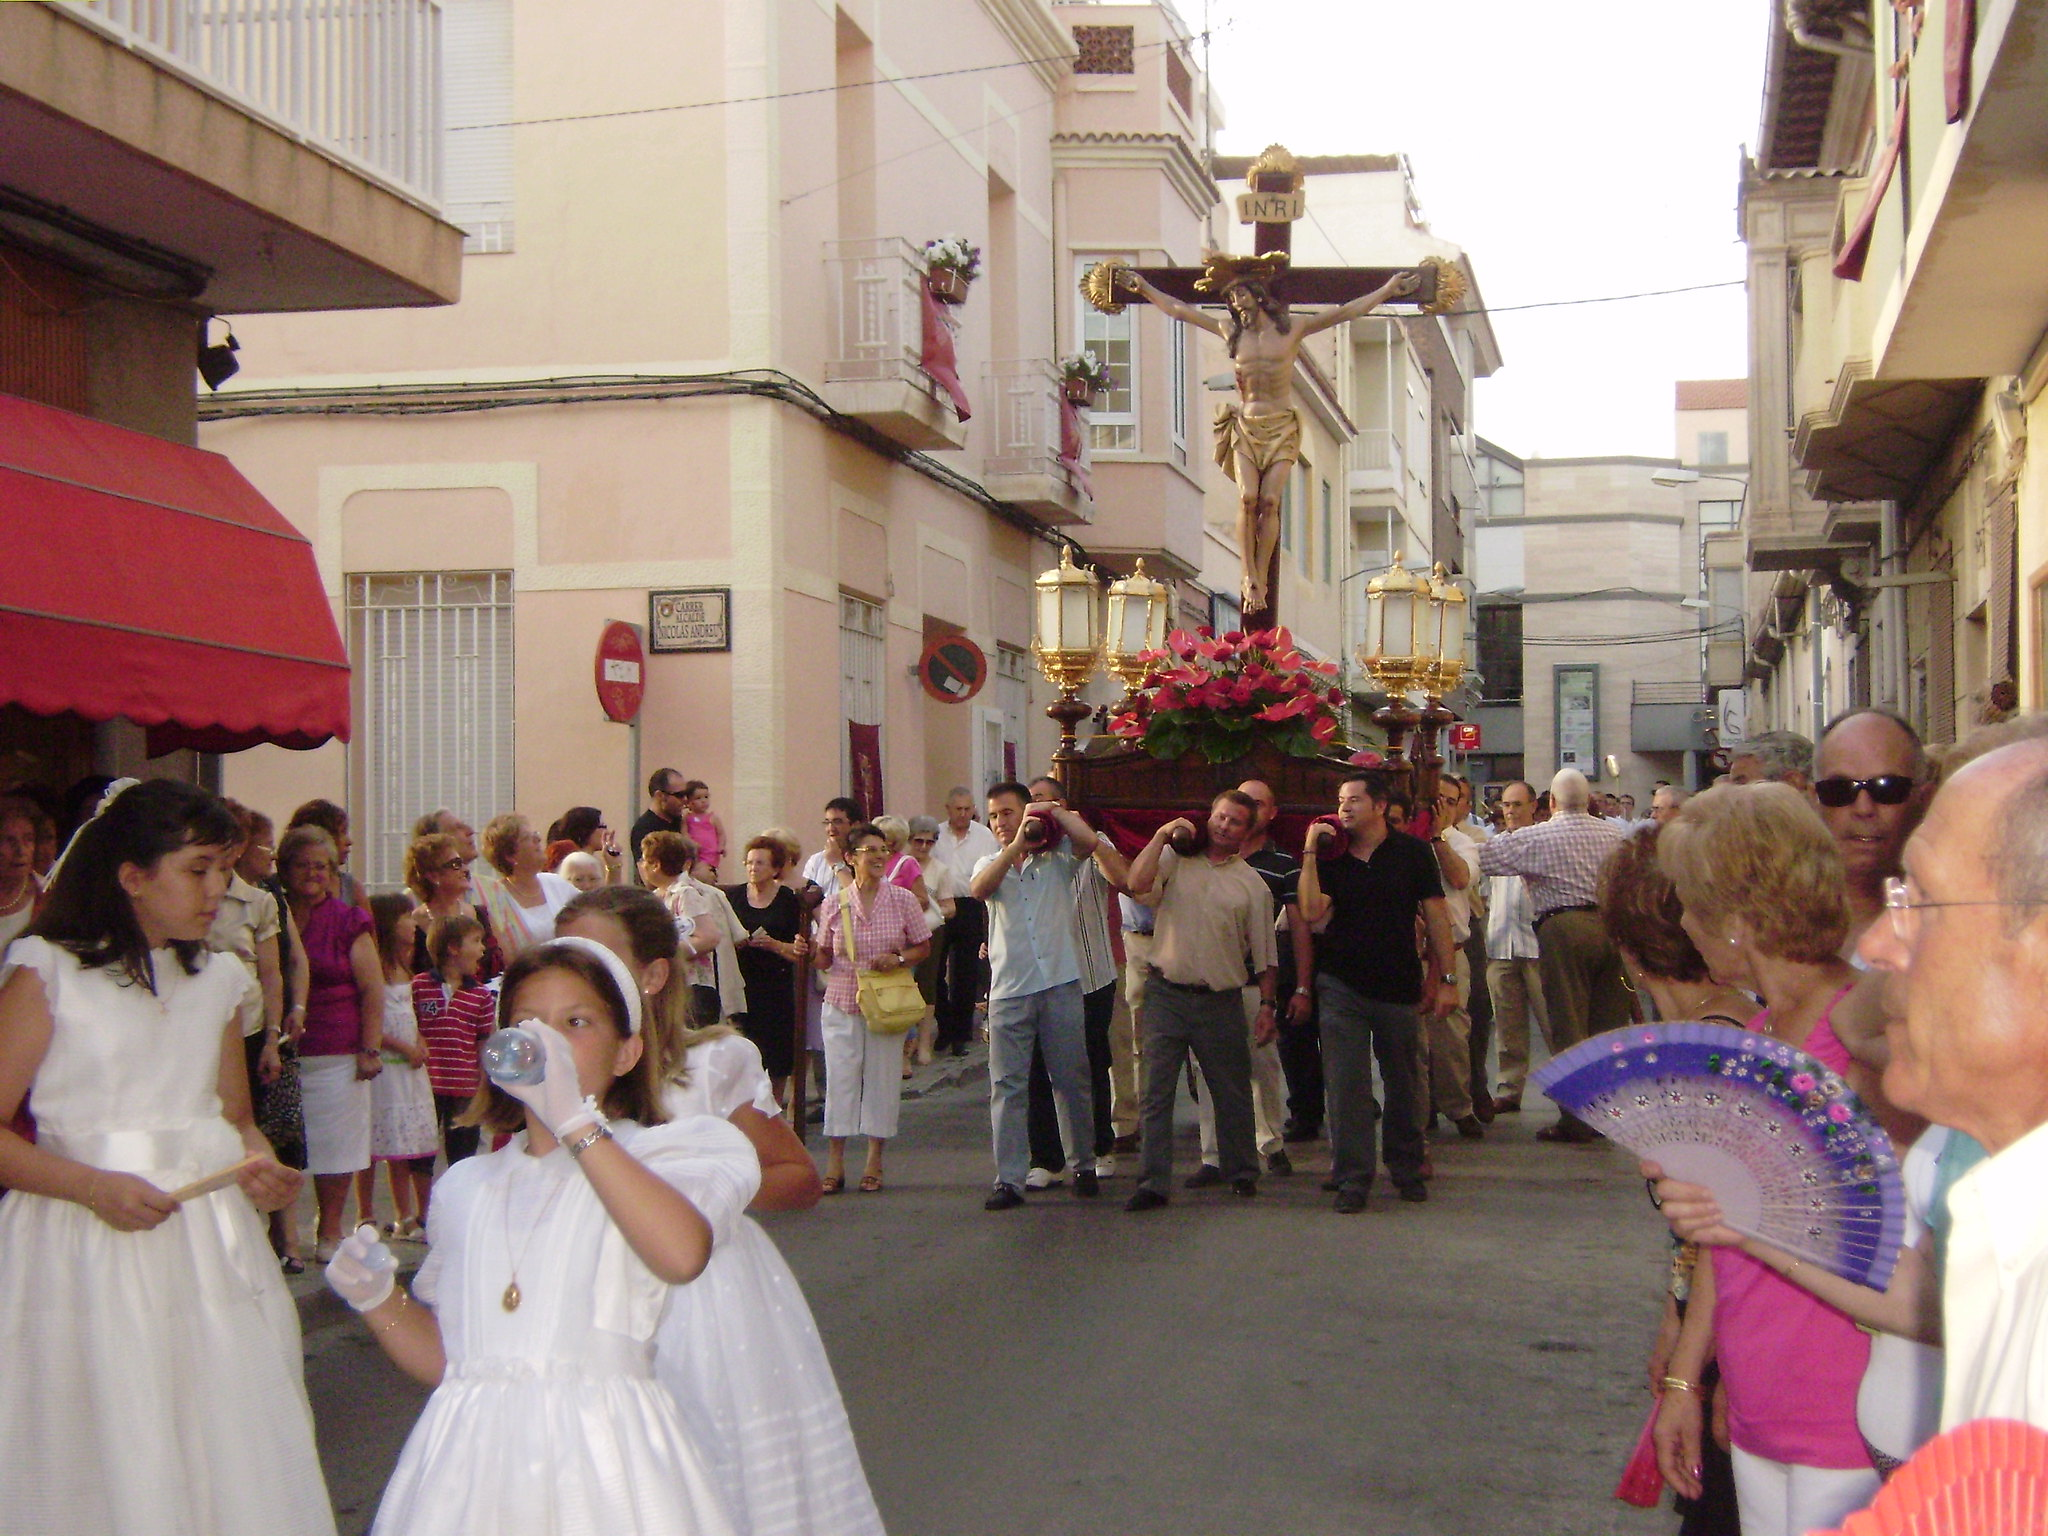 (2009-07-05) - Procesión Subida - Javier Romero Ripoll - (10)